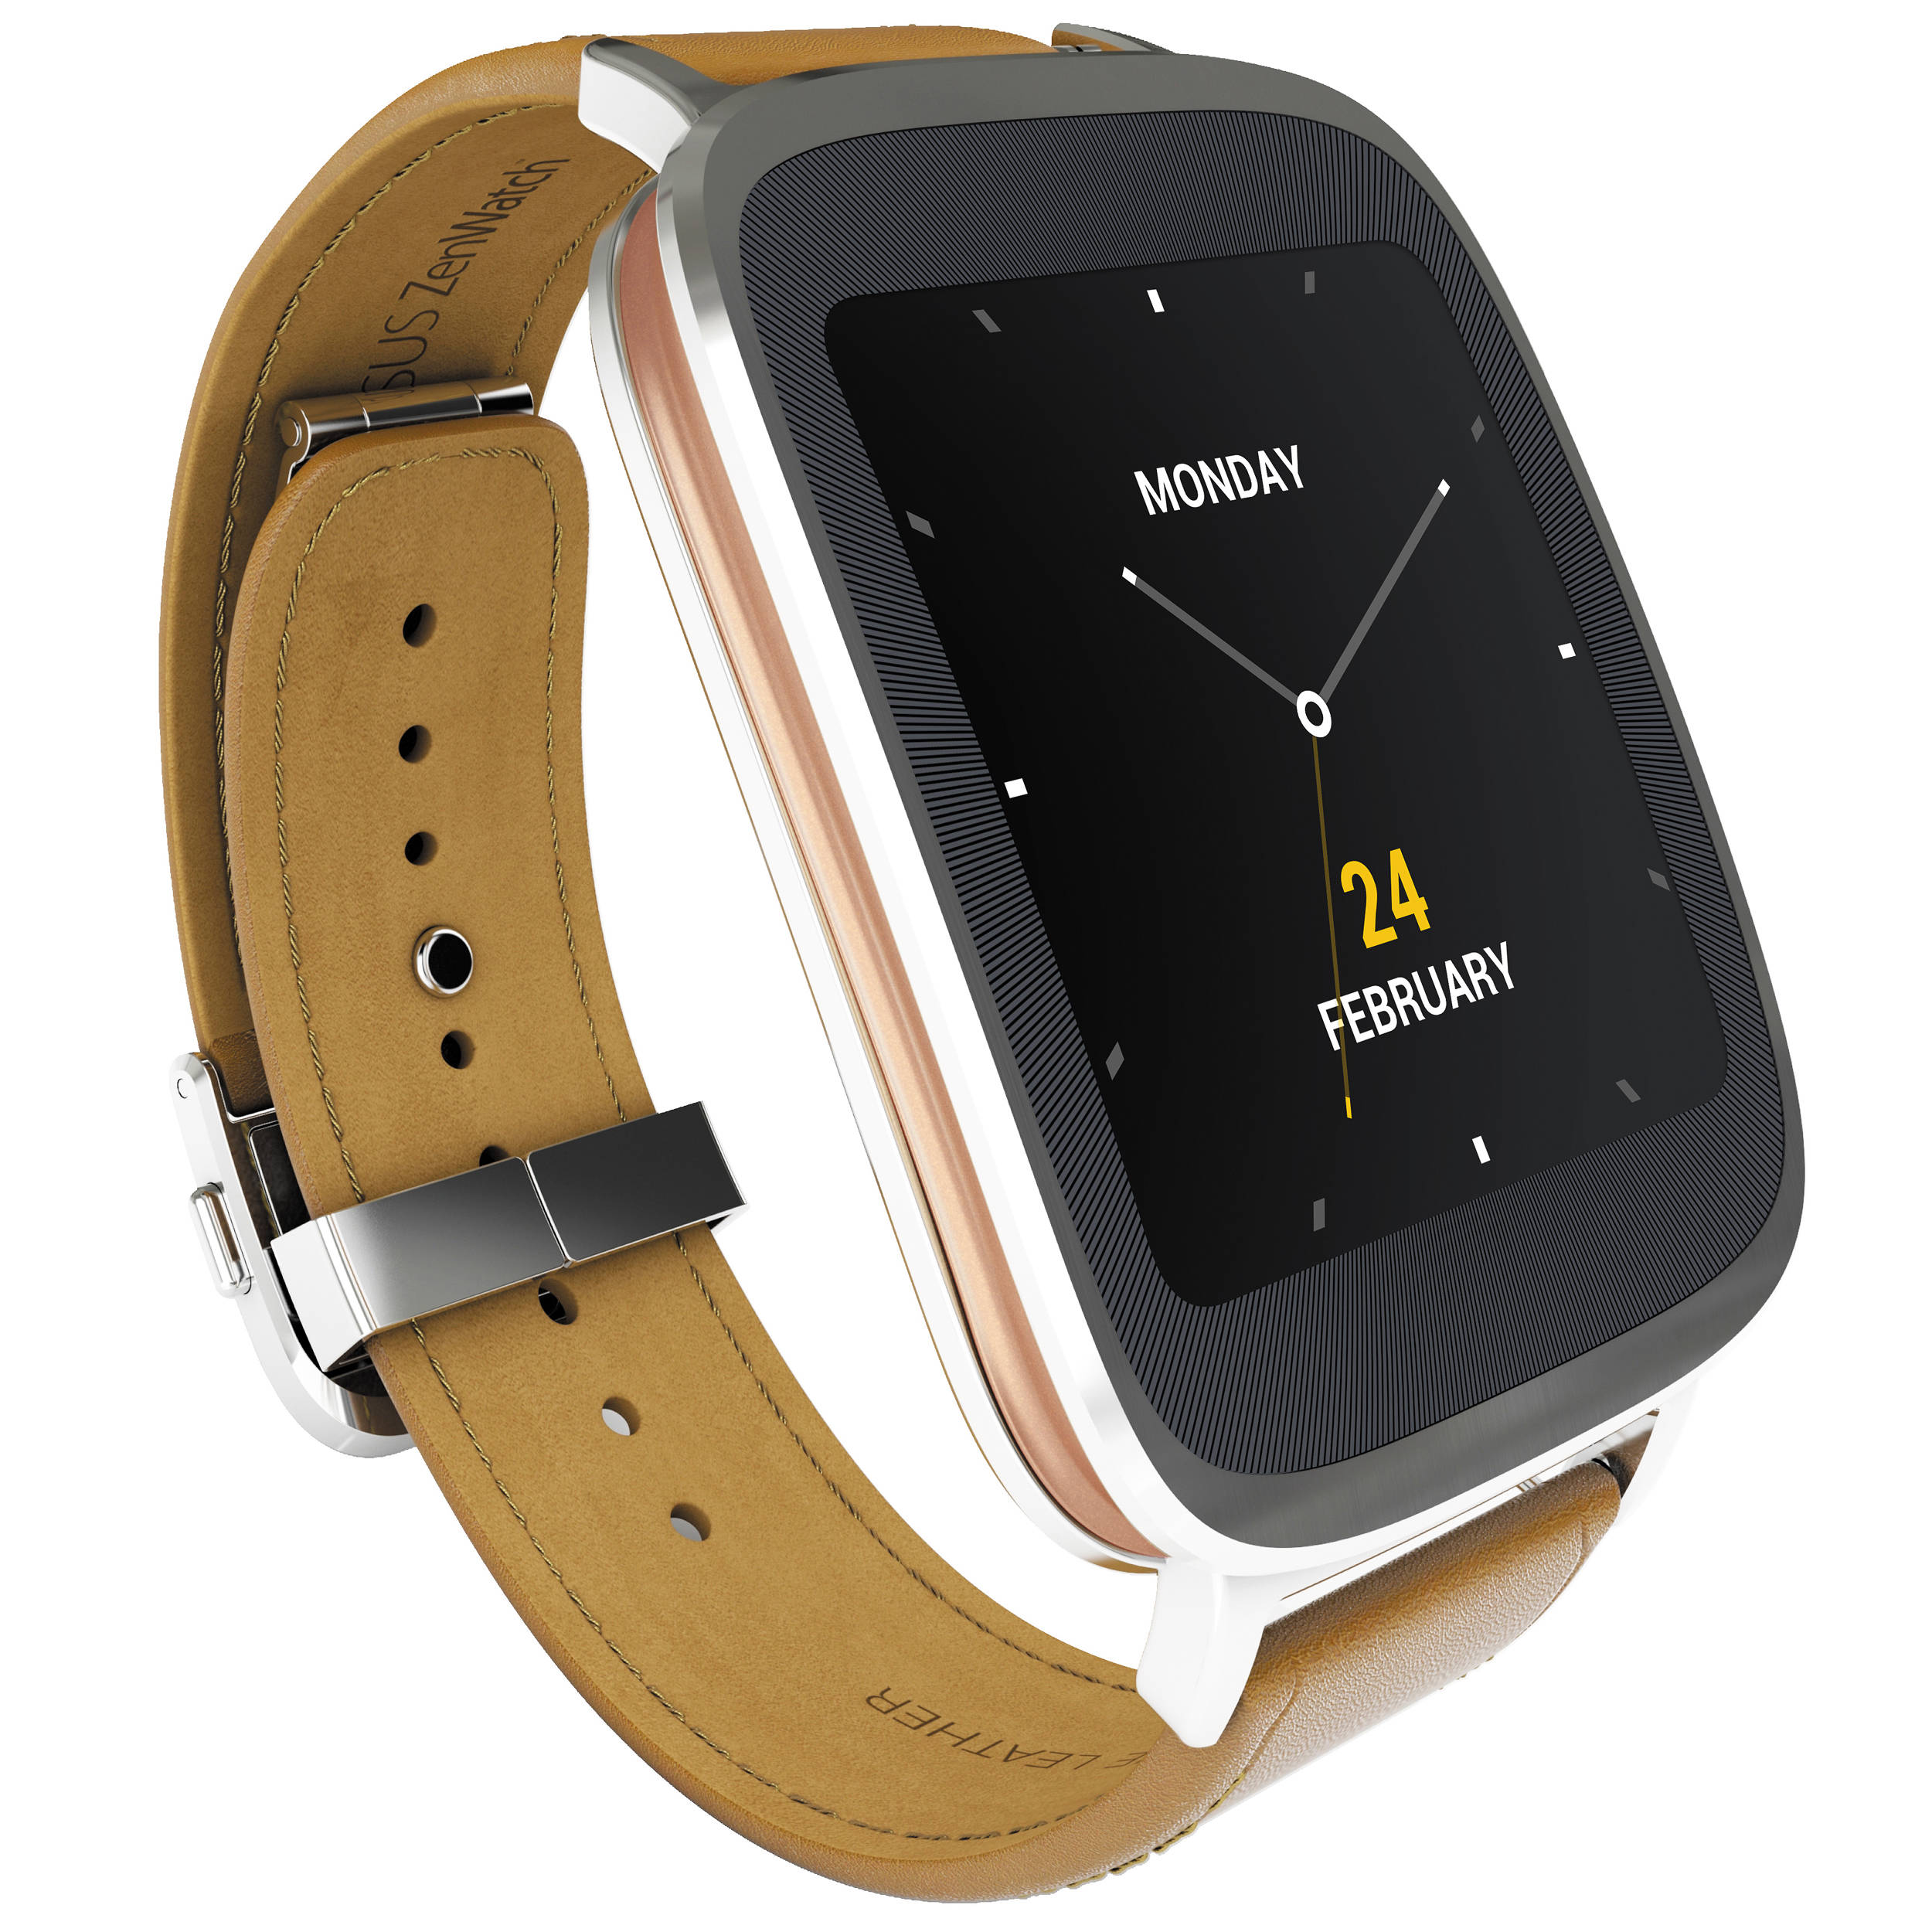 ASUS ZenWatch Android Wear Smartwatch 90NZ0011-M00090 B&H ...